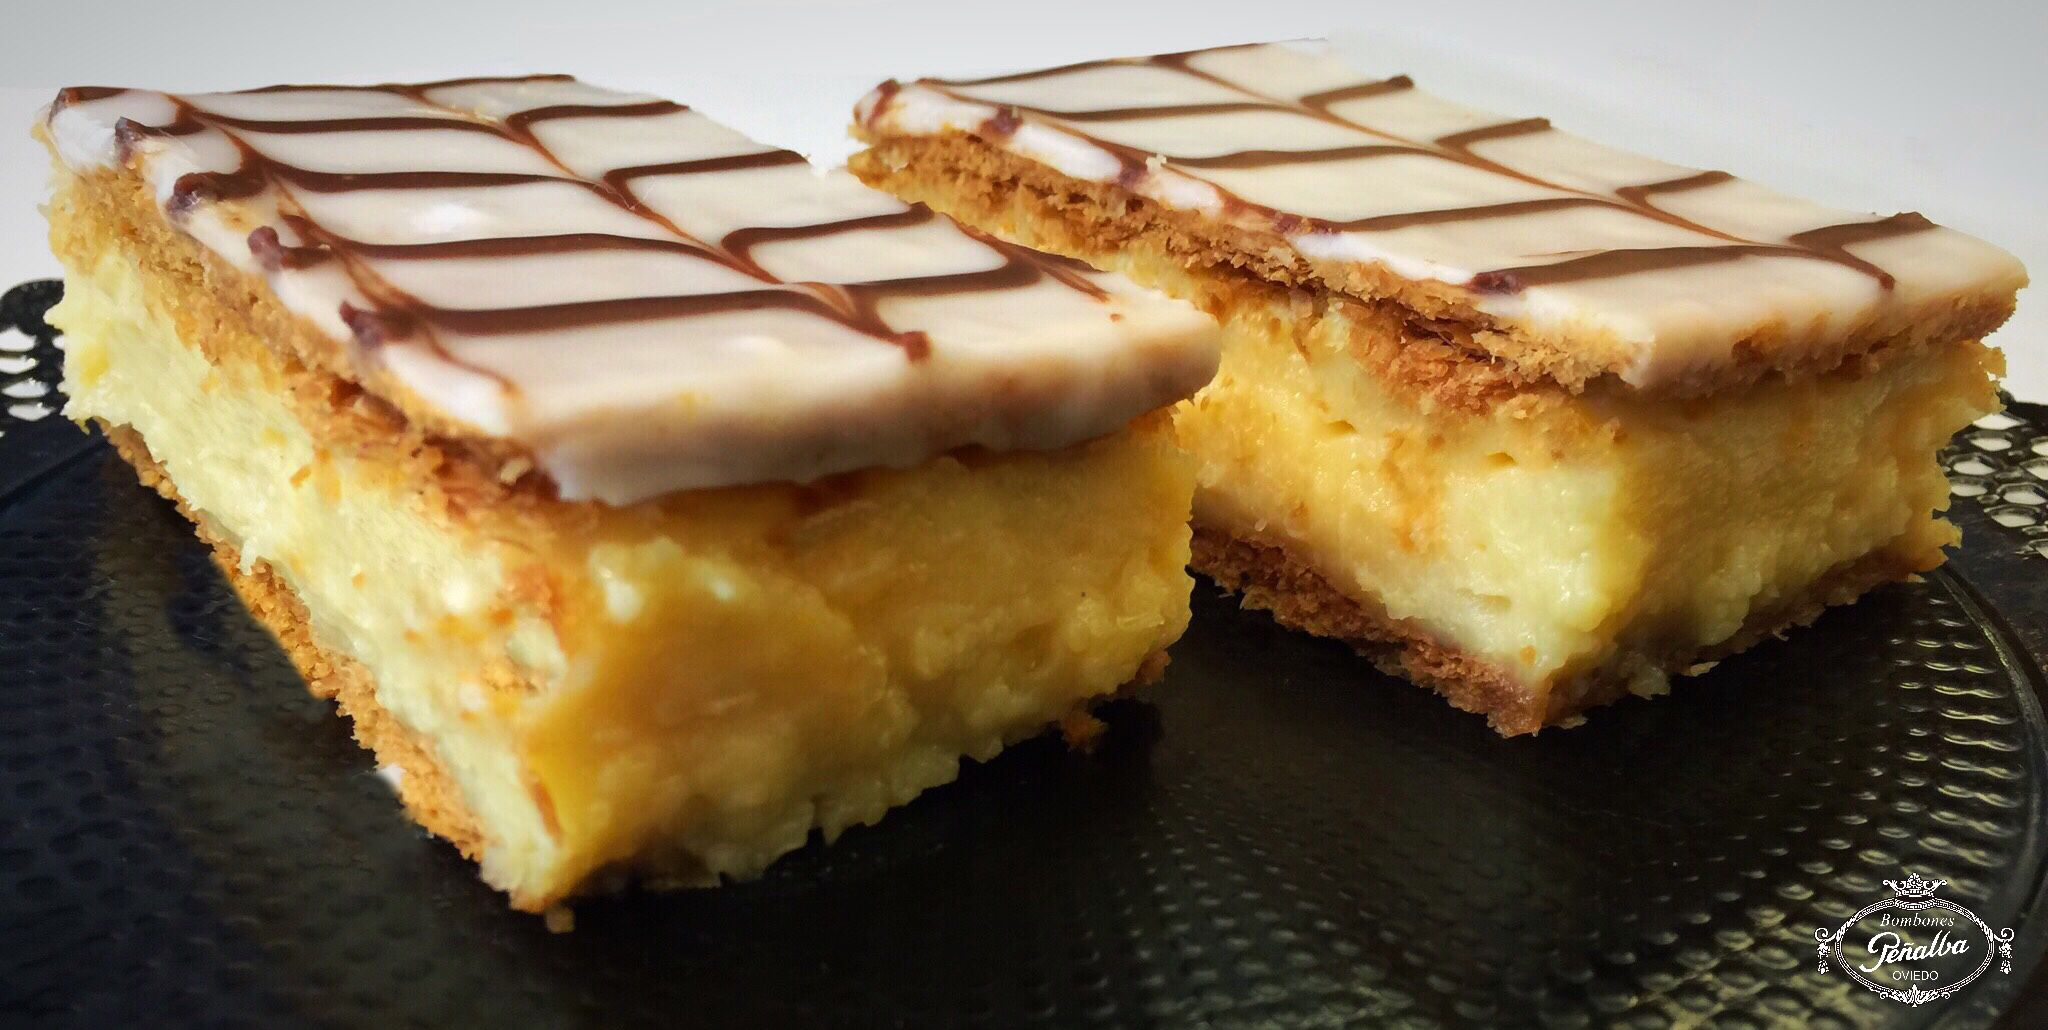 Pastel de Milhojas, Deliciosa crema pastelera con hojaldre.  Mmmmmmm.... 😍😍😍 #bombonespeñalba #oviedo #milhojas #pastel #delicious #sweet #instafood